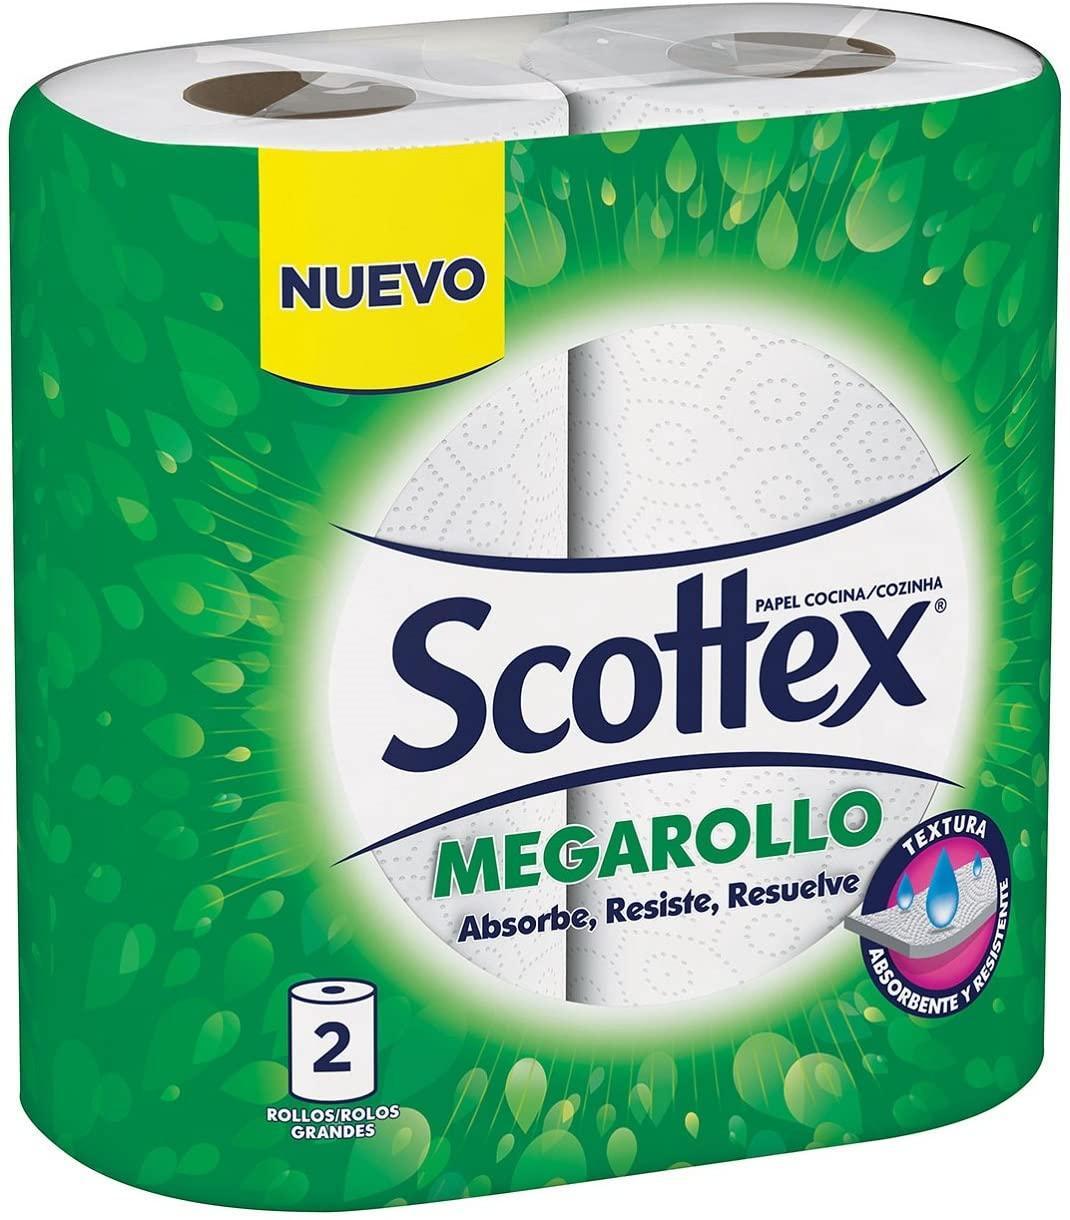 Scottex cocina Megarollo 2r